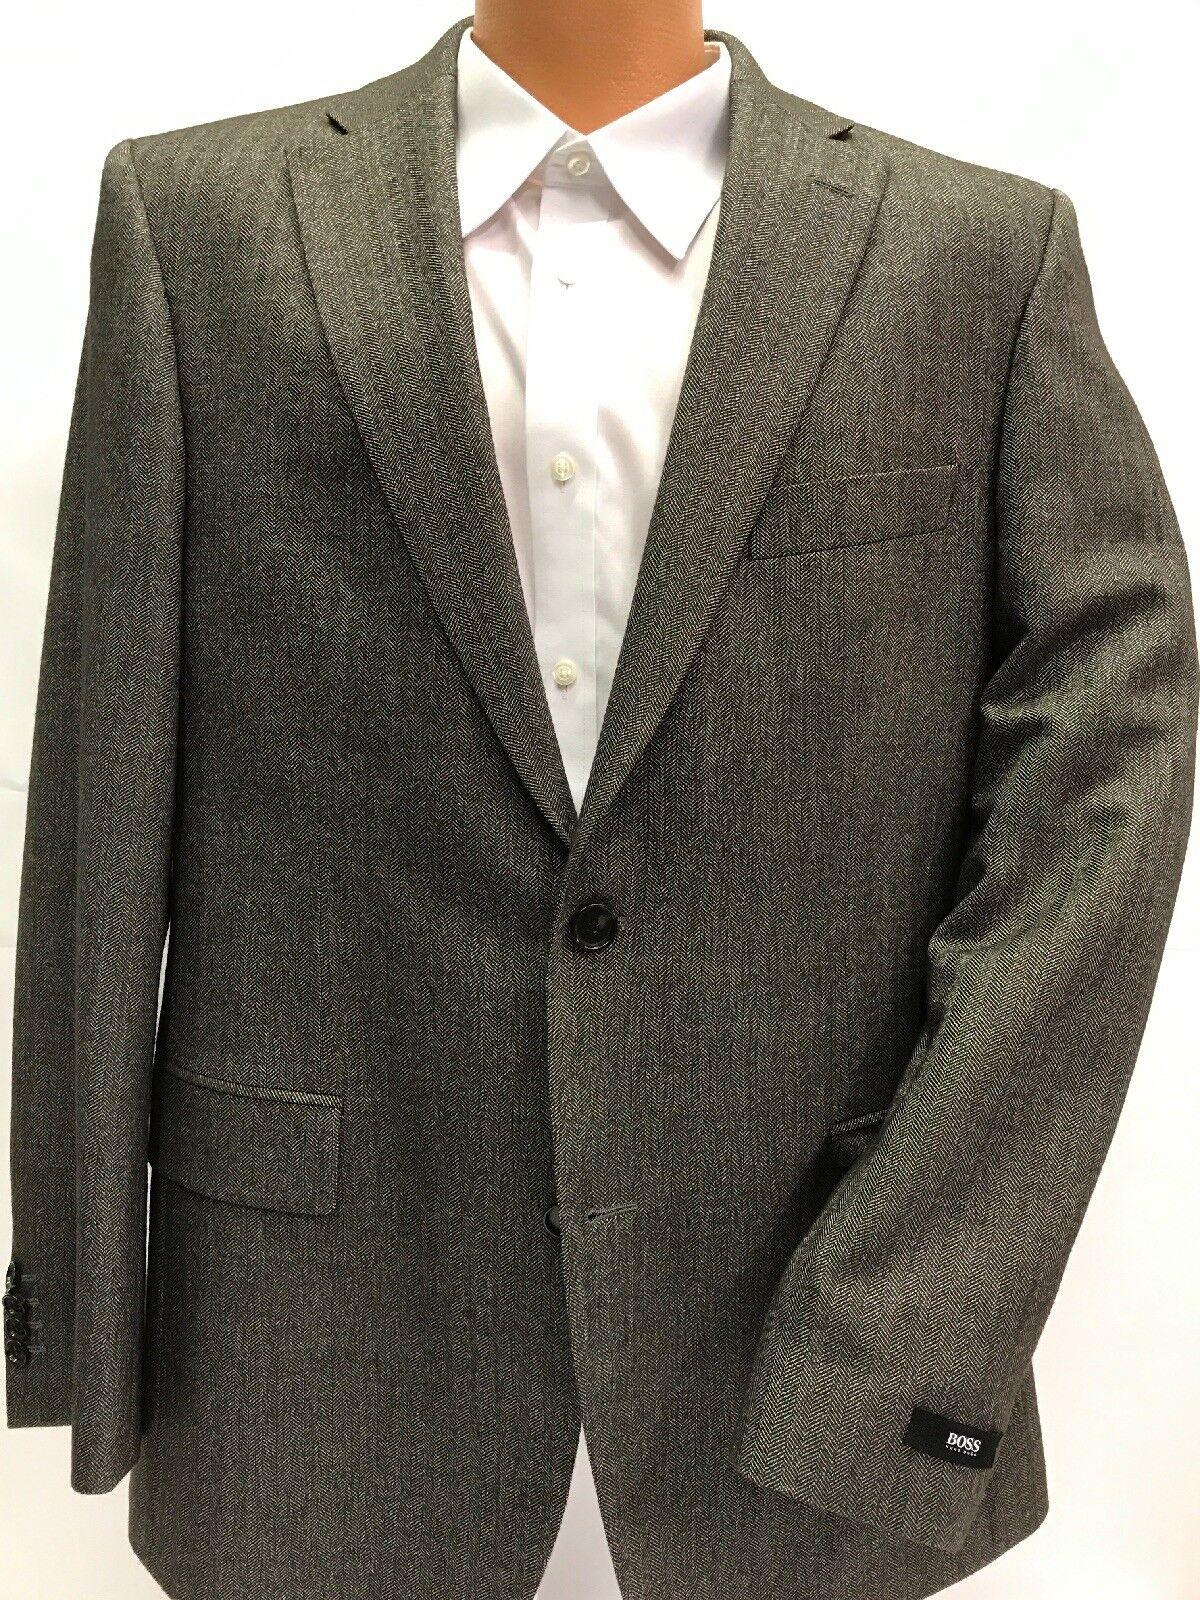 NWT HUGO BOSS grau Braun PASINI2 2-Vent Comfort Fit Sport Coat Wool Silk Blend